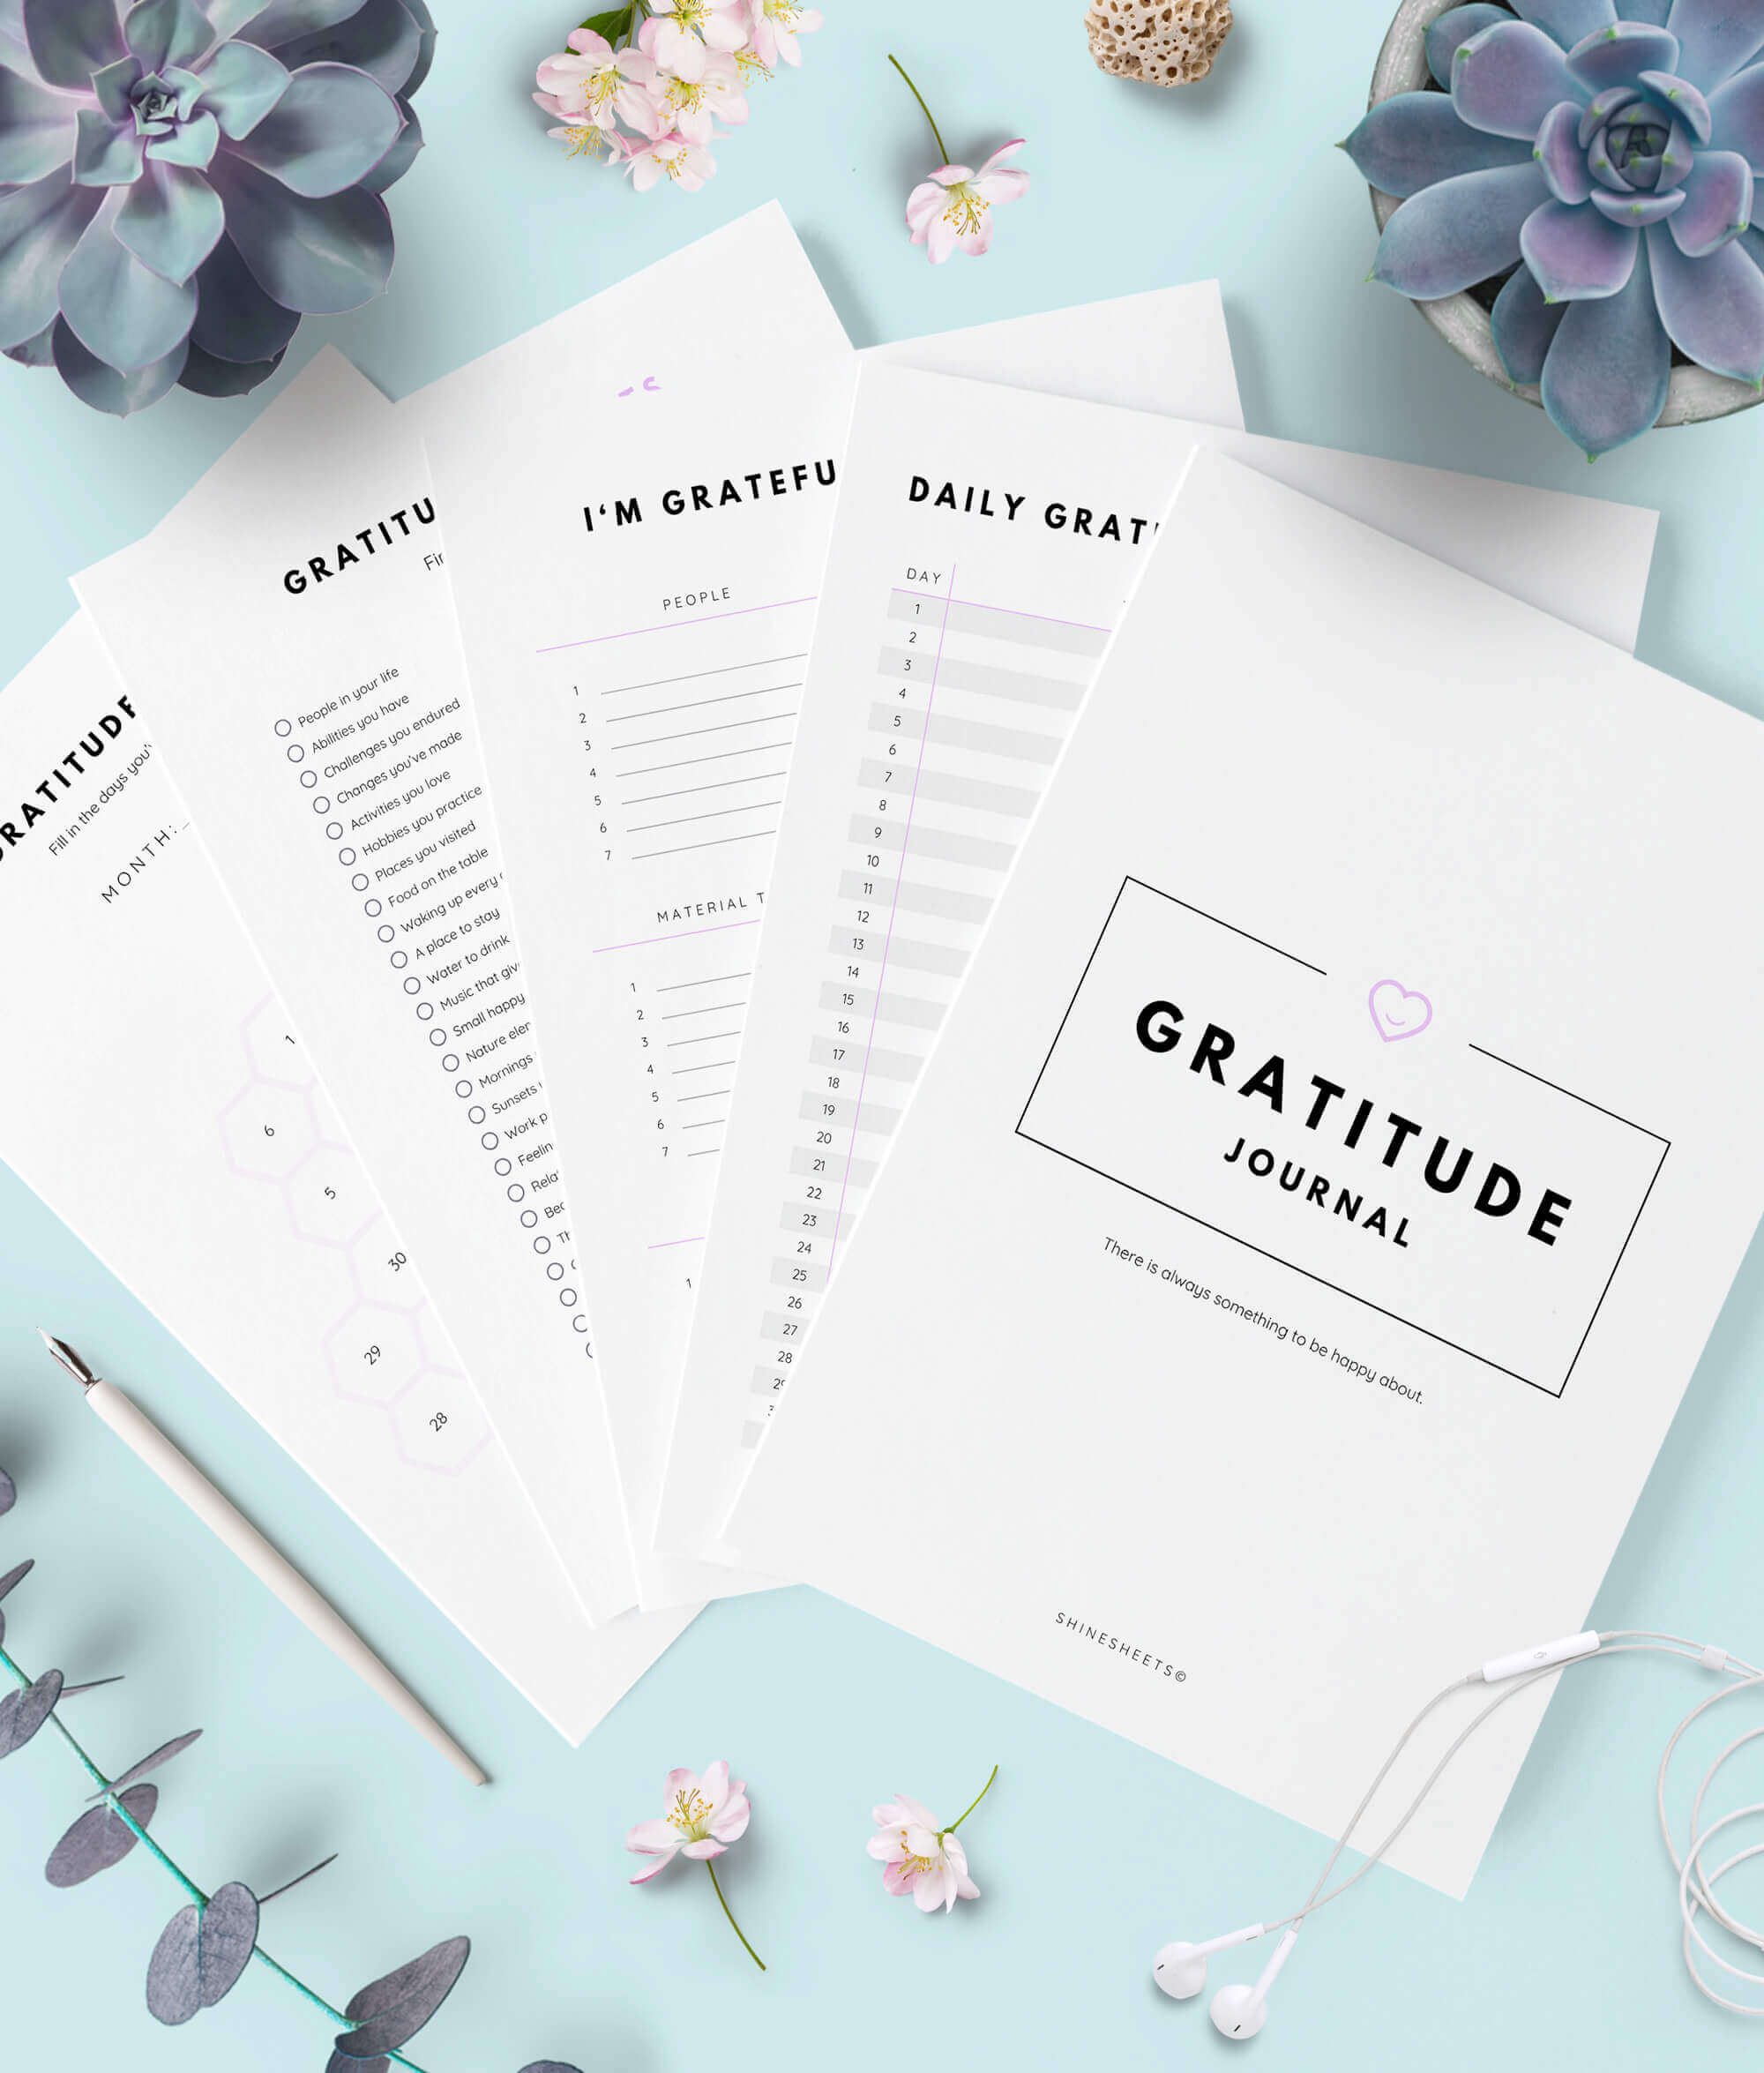 Gratitude Journal Printable 10 Pages